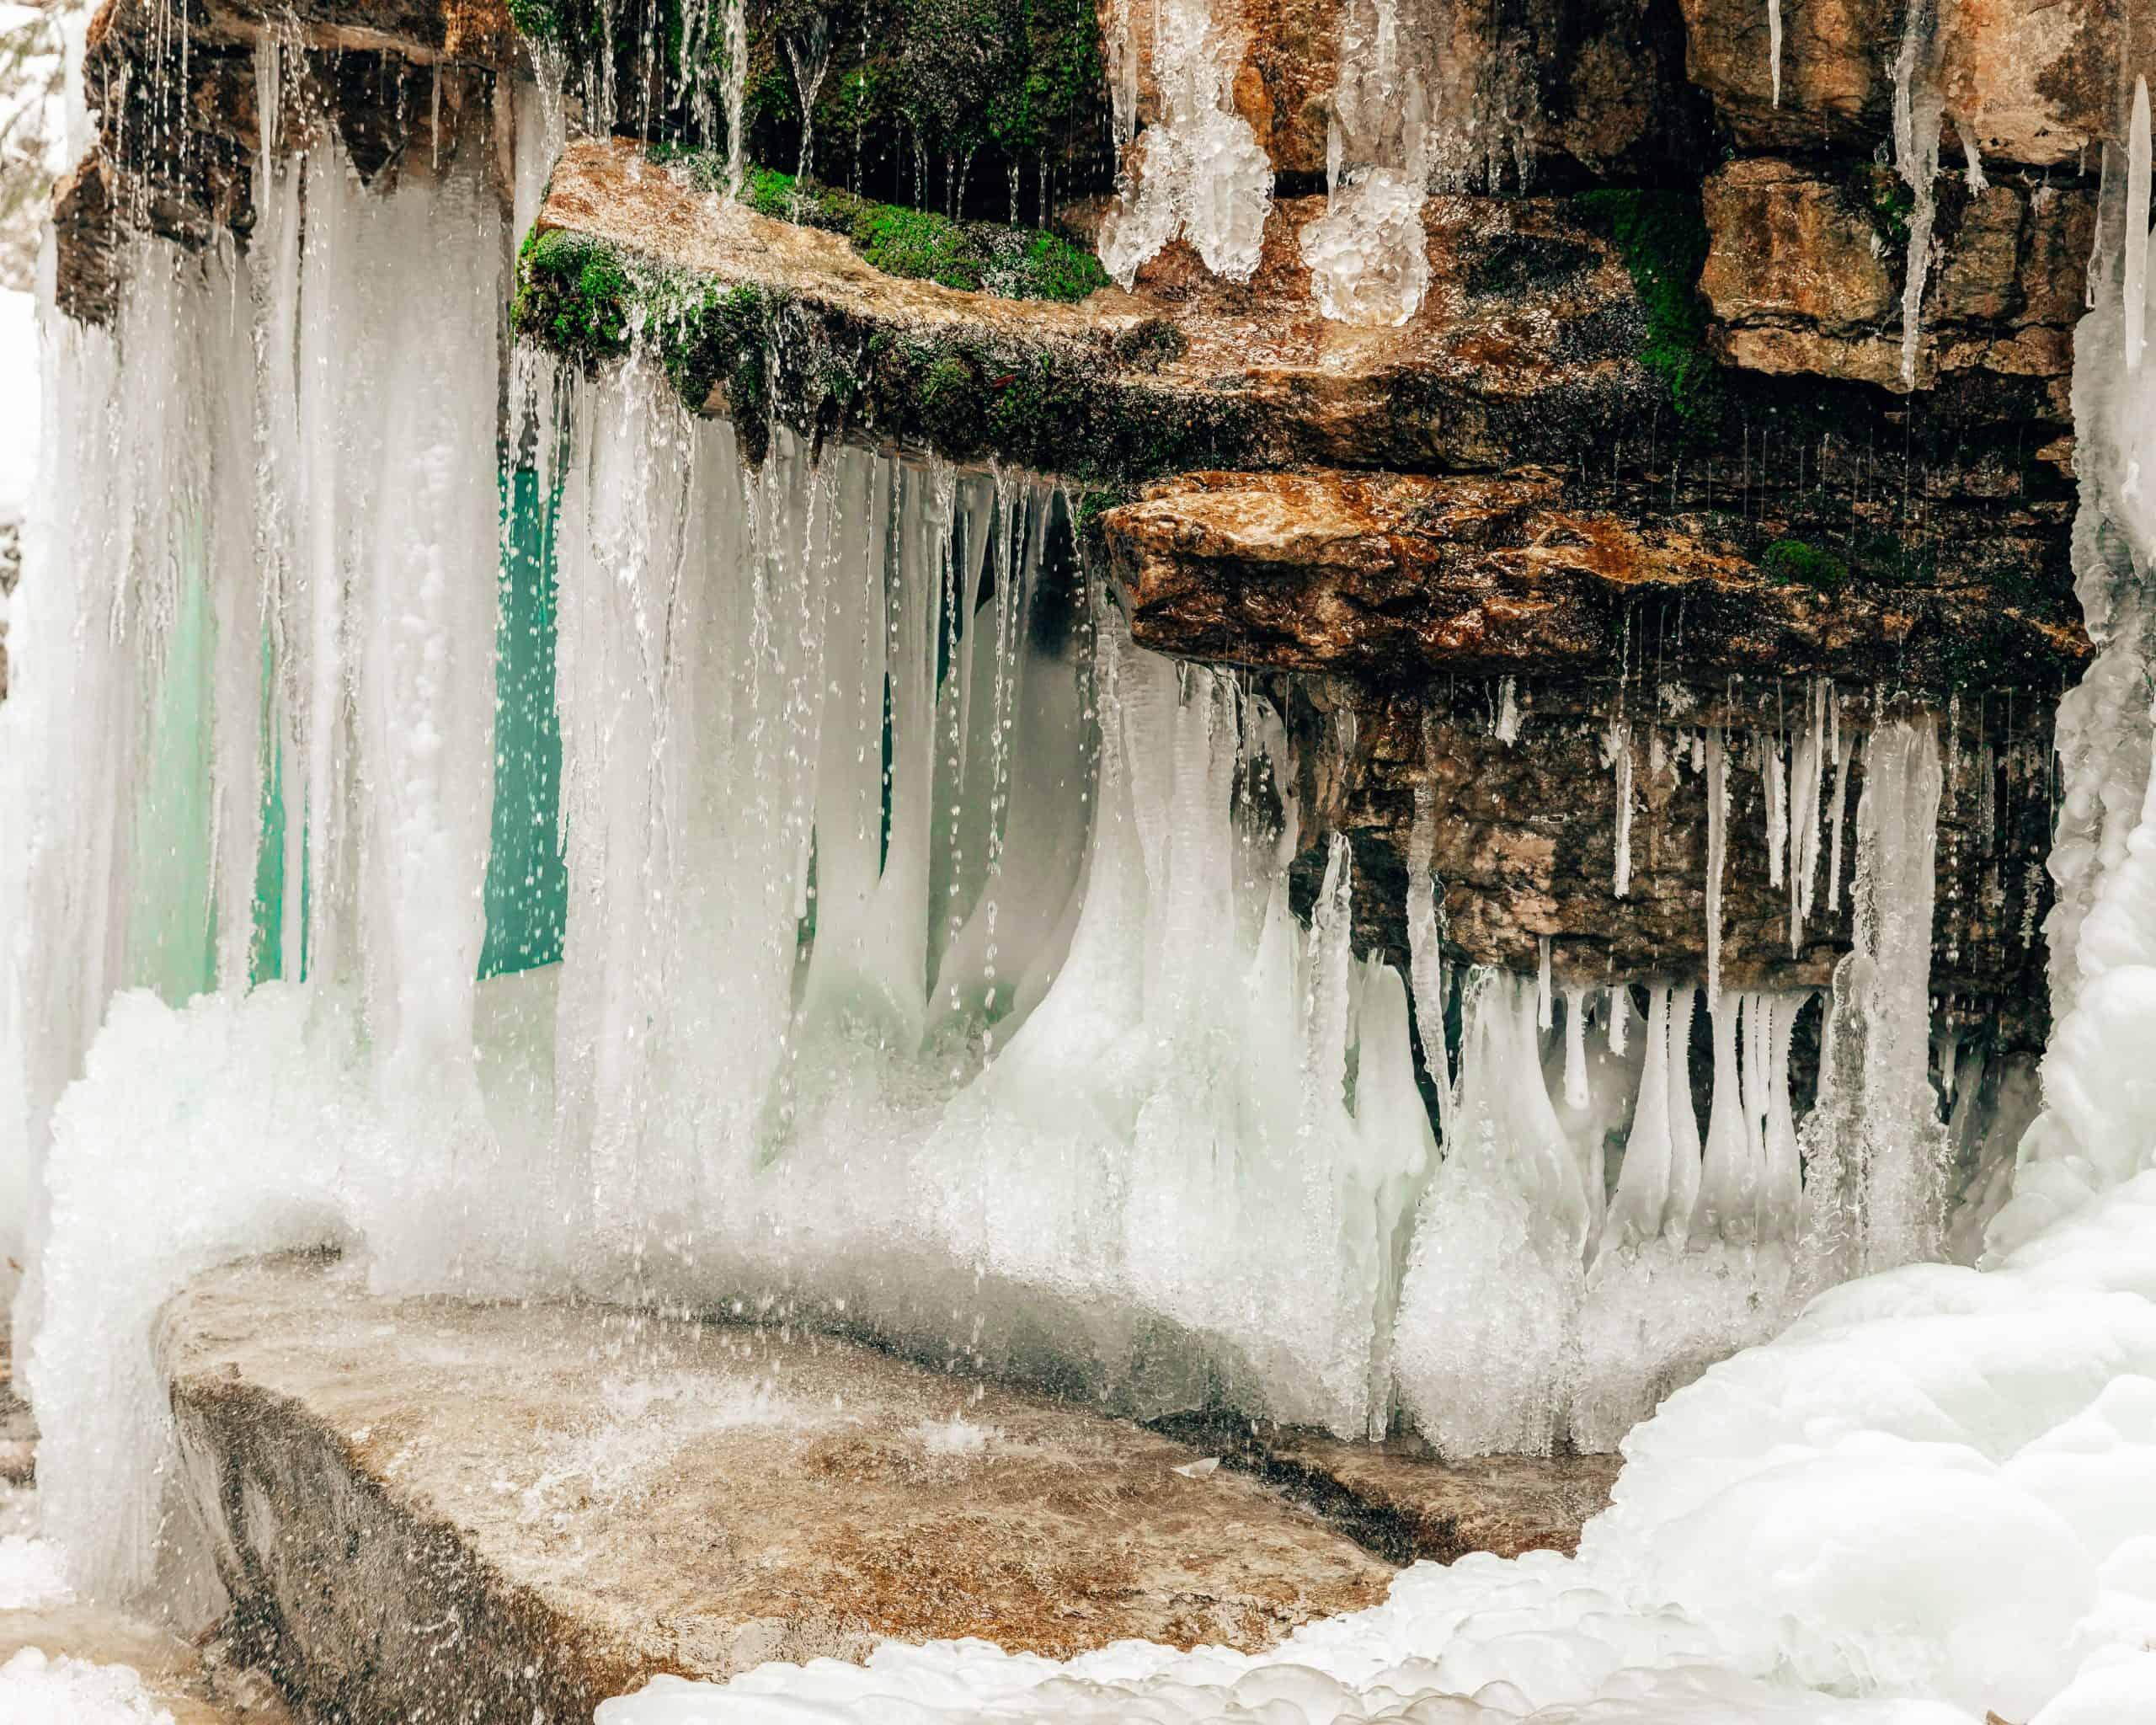 Frozen Waterfall at Maligne Canyon, Canada